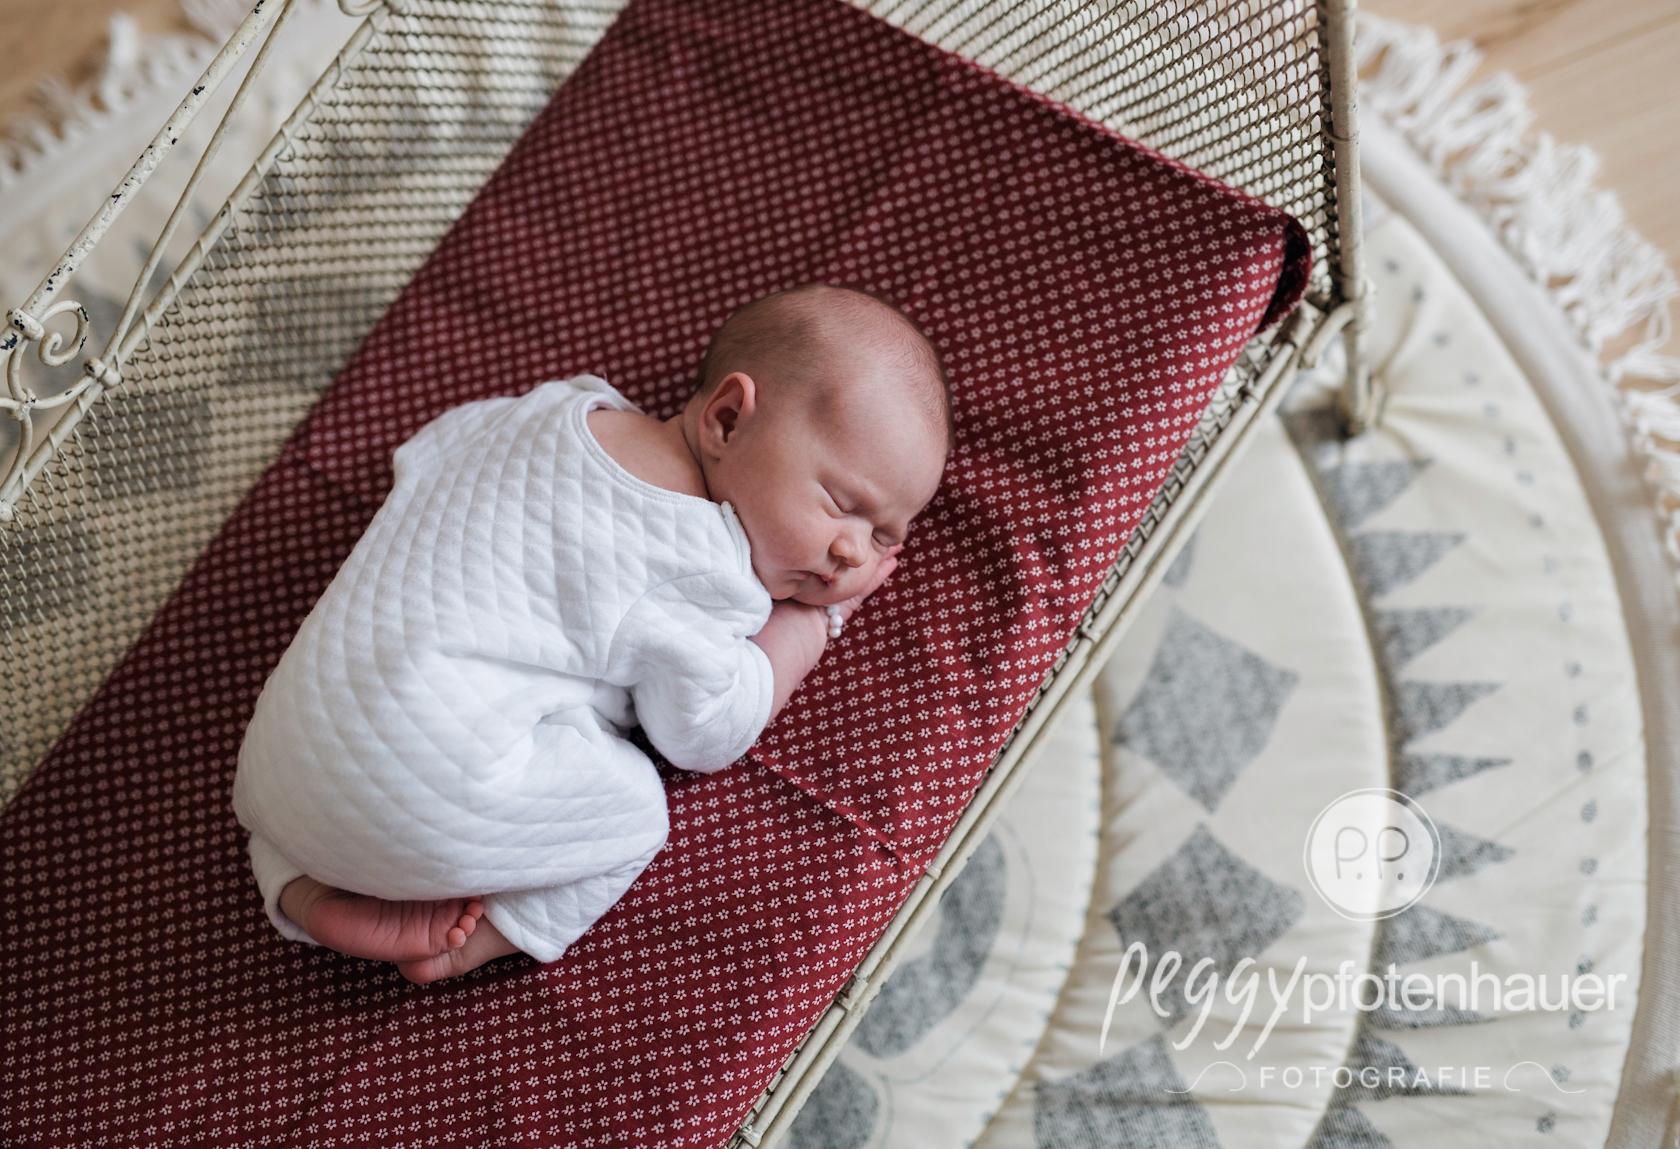 Neugeborenenphotos Peggy Pfotenhauer Fotografie